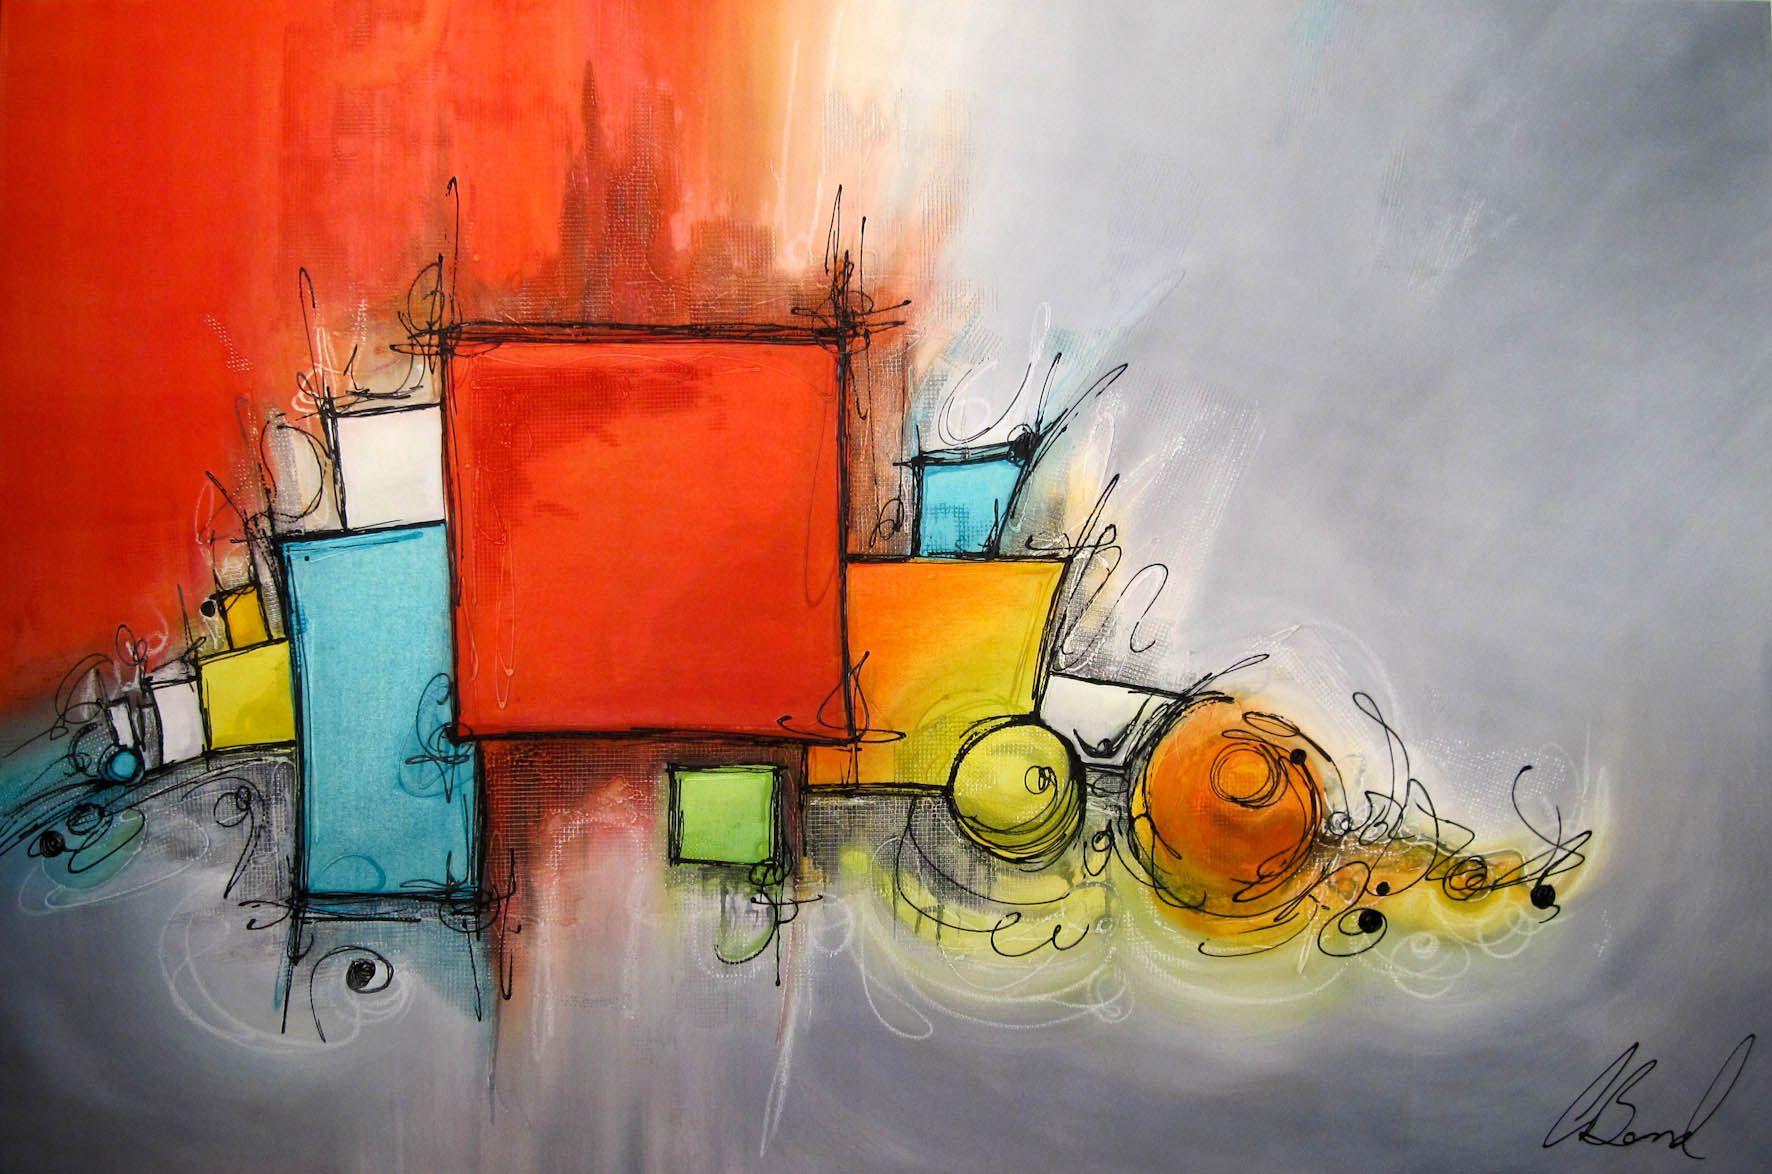 Contemporary Abstract Art Wallpaper Background With High Resolution Wallpaper 1772x117 Modern Art Paintings Abstract Modern Art Abstract Abstract Art Wallpaper